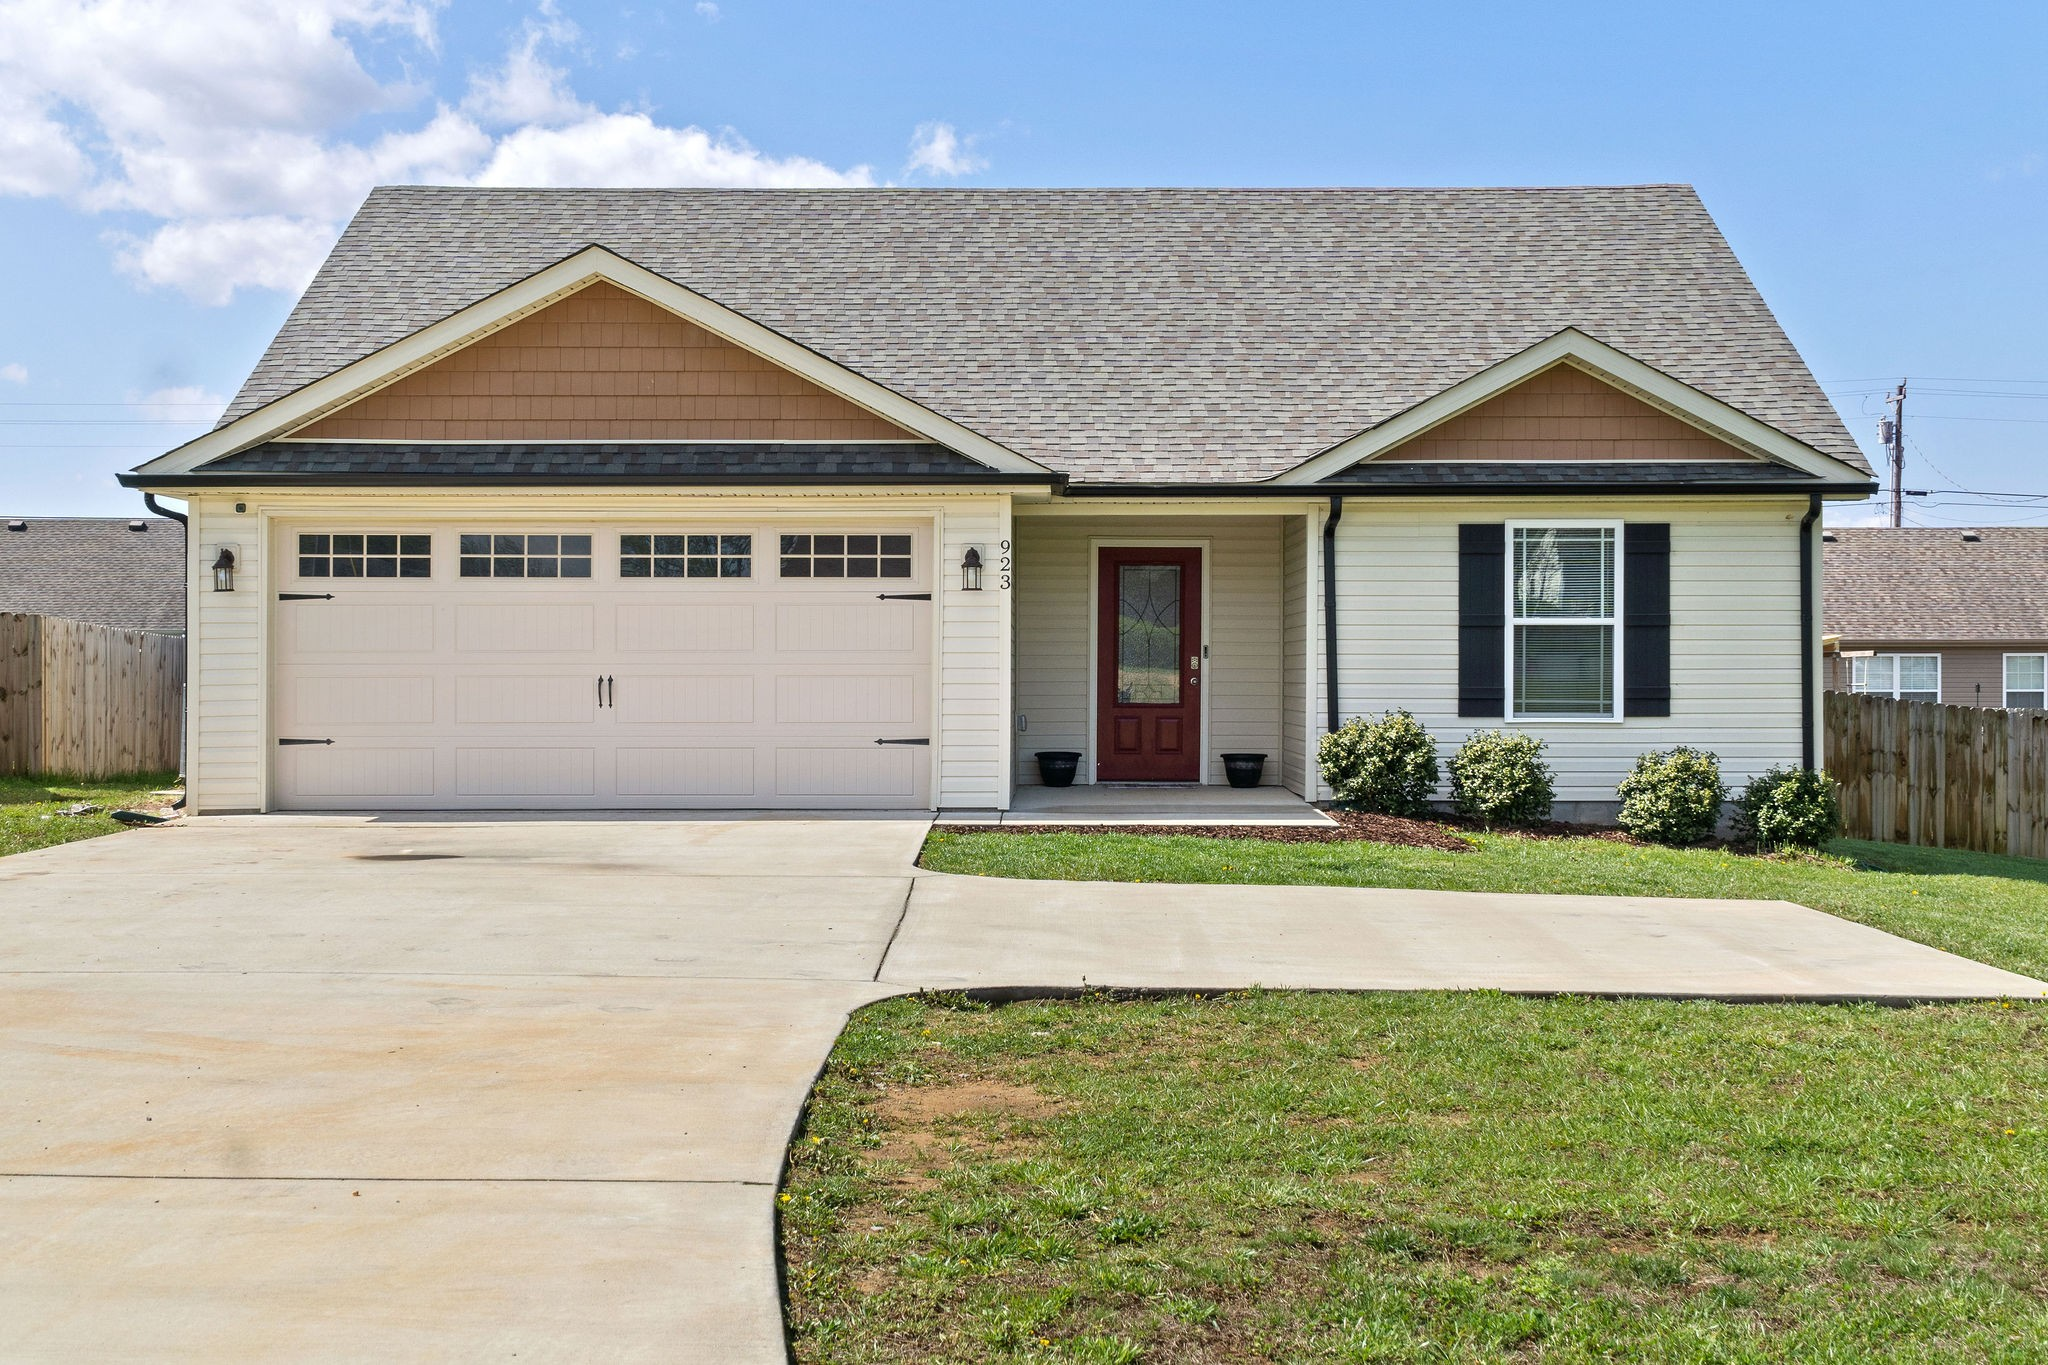 923 Hugh Hunter Rd Property Photo - Oak Grove, KY real estate listing